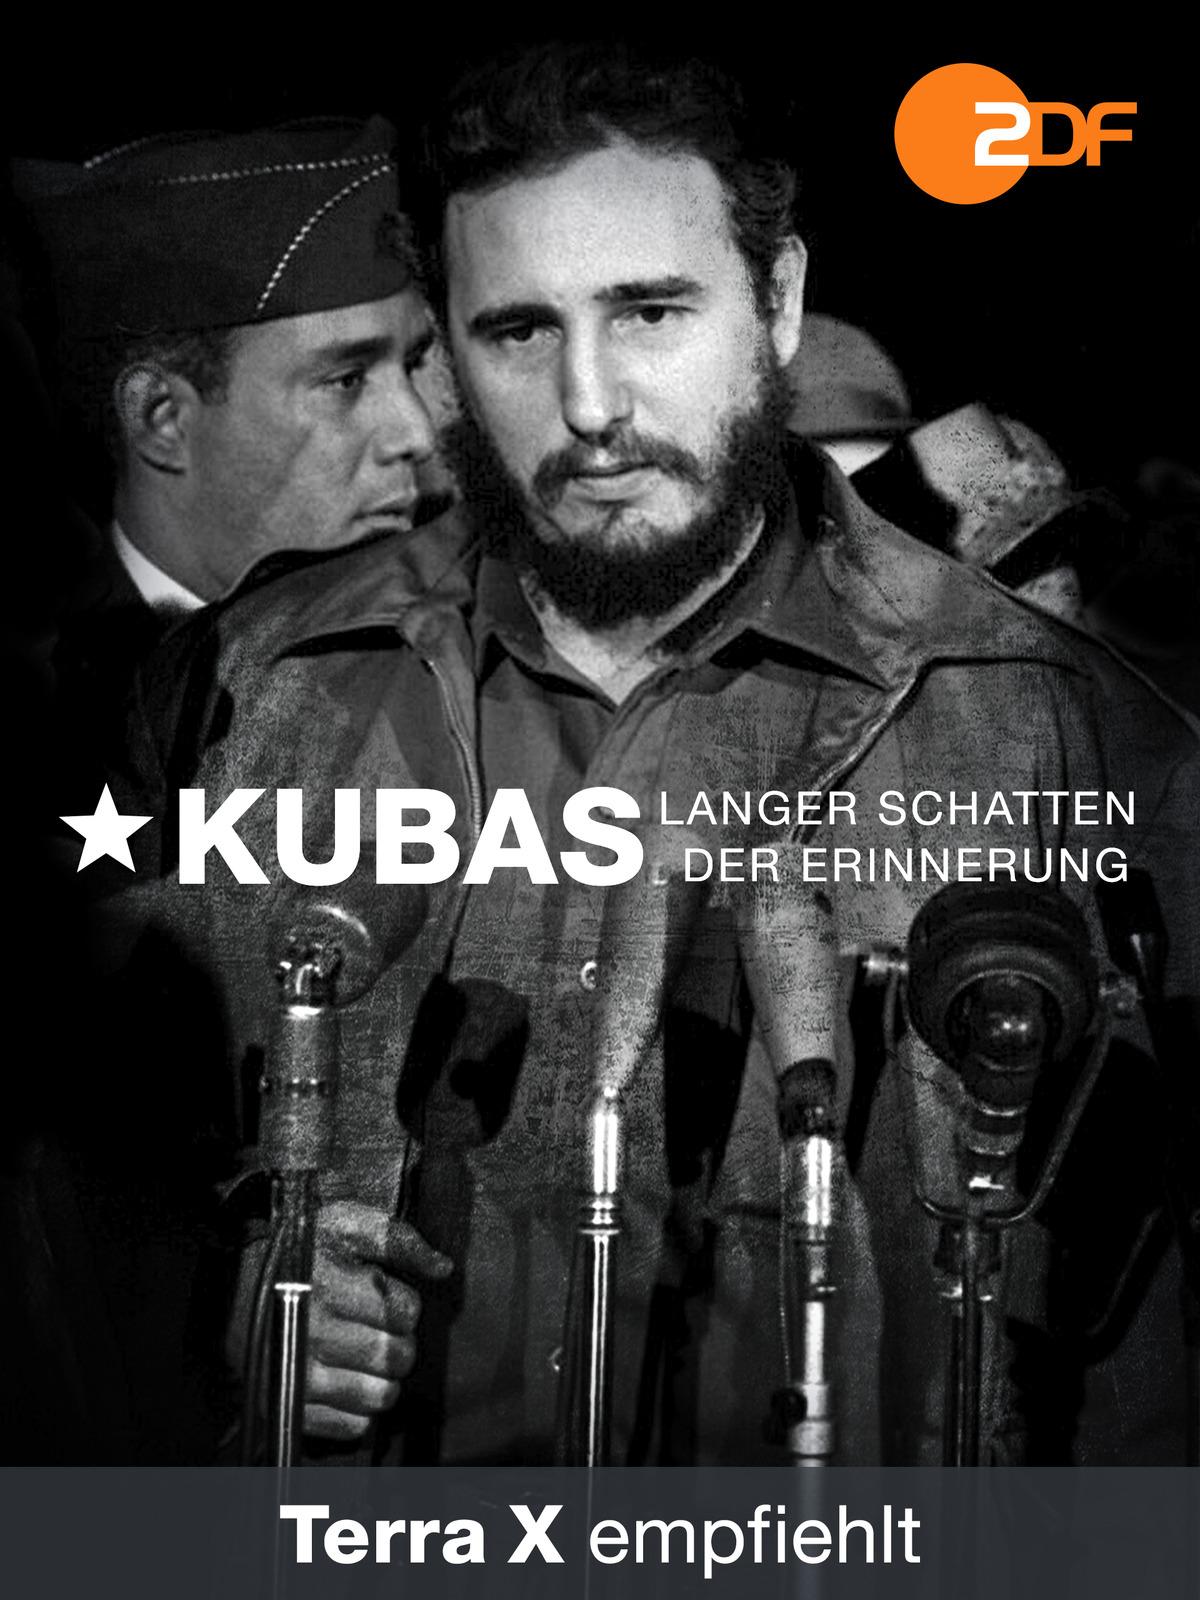 Kubas langer Schatten der Erinnerung